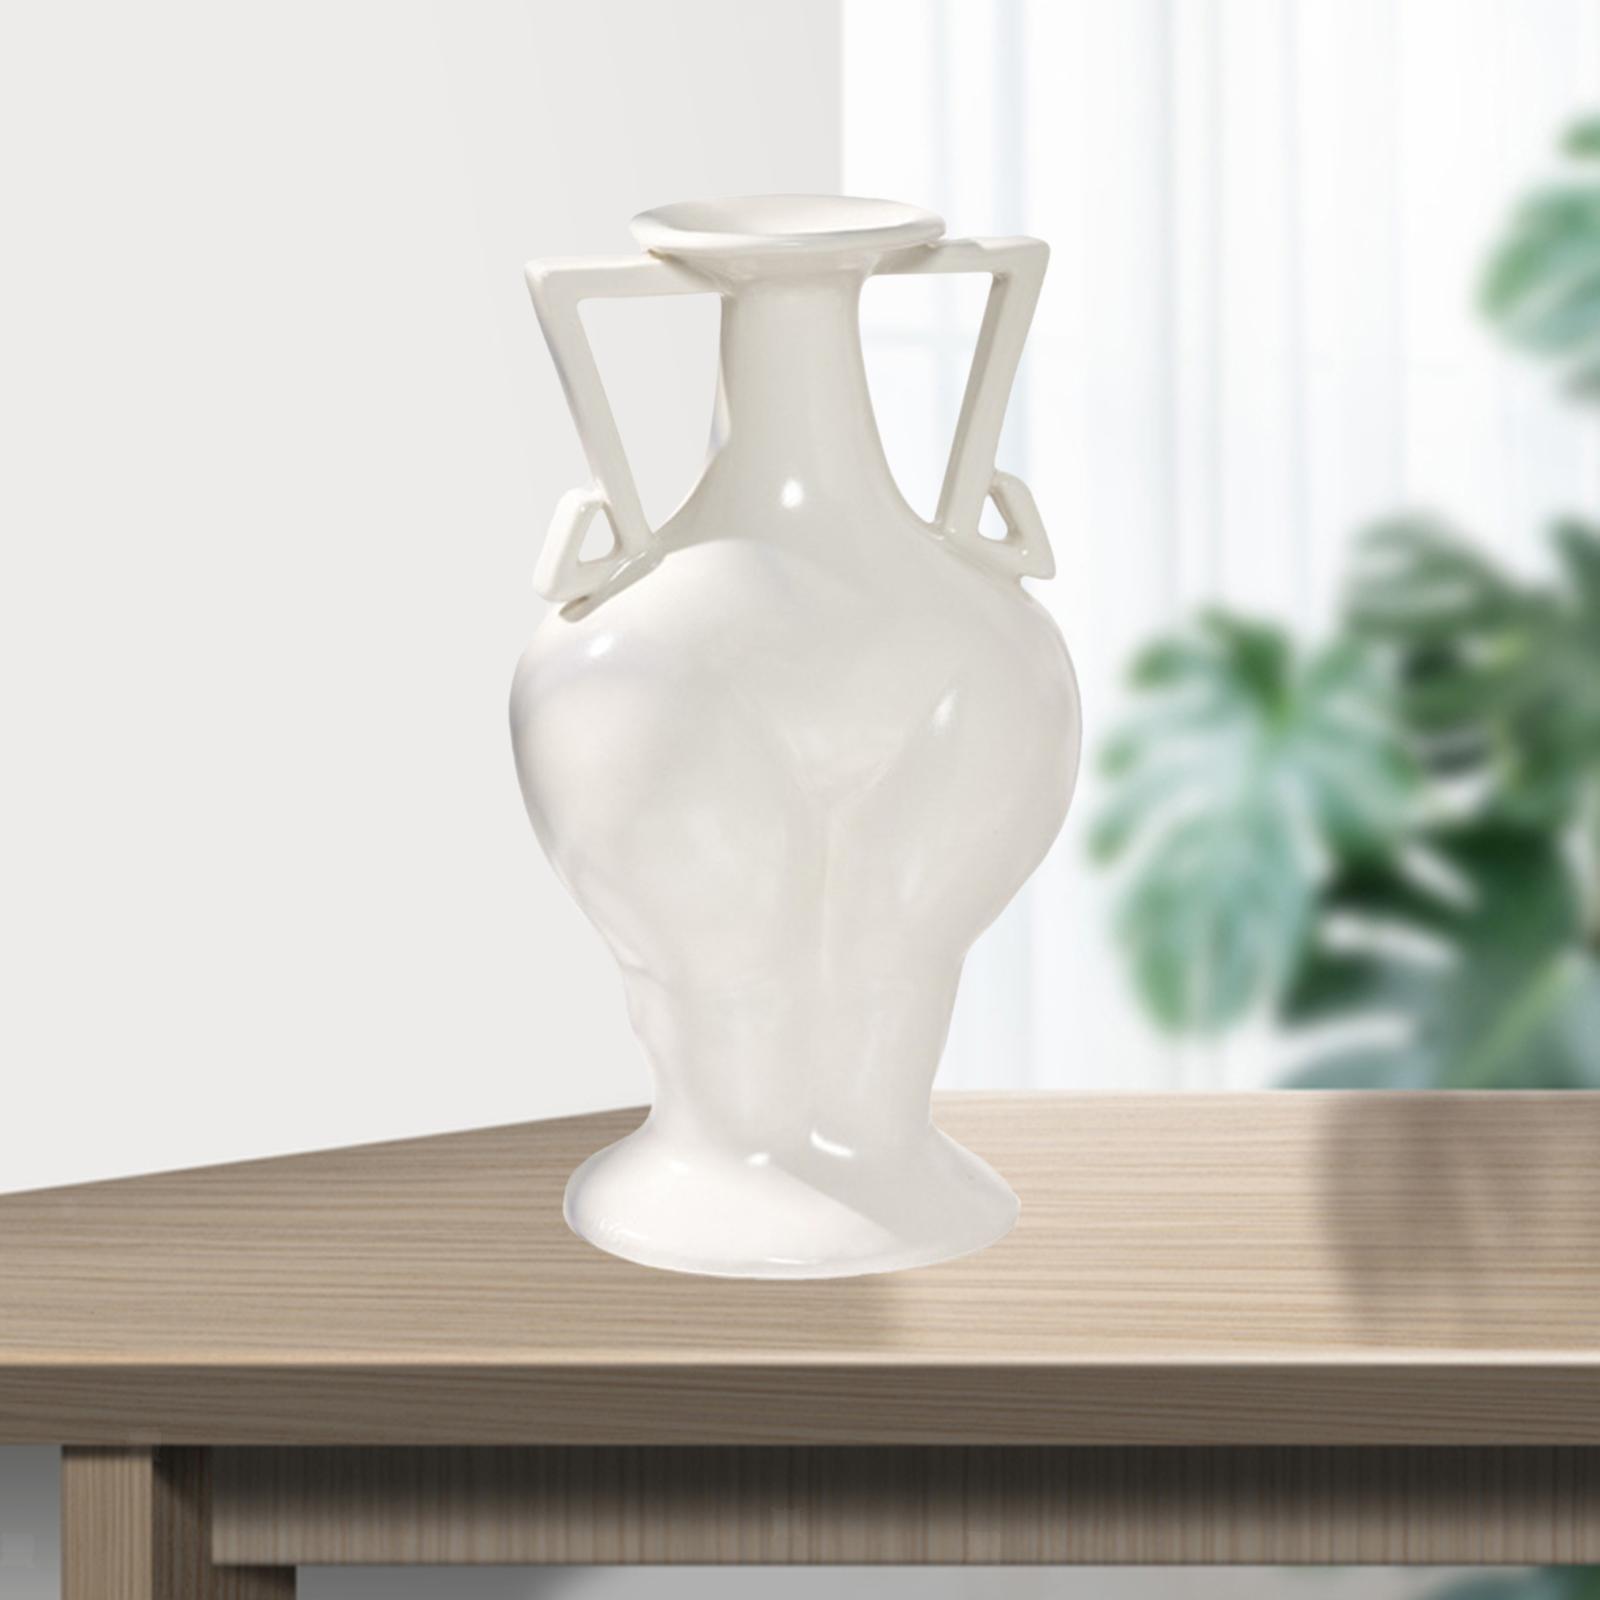 Indexbild 26 - Blumenvase Keramik Blumentöpfe Trockenblumenhalter Pflanzenvasen Wohnkultur